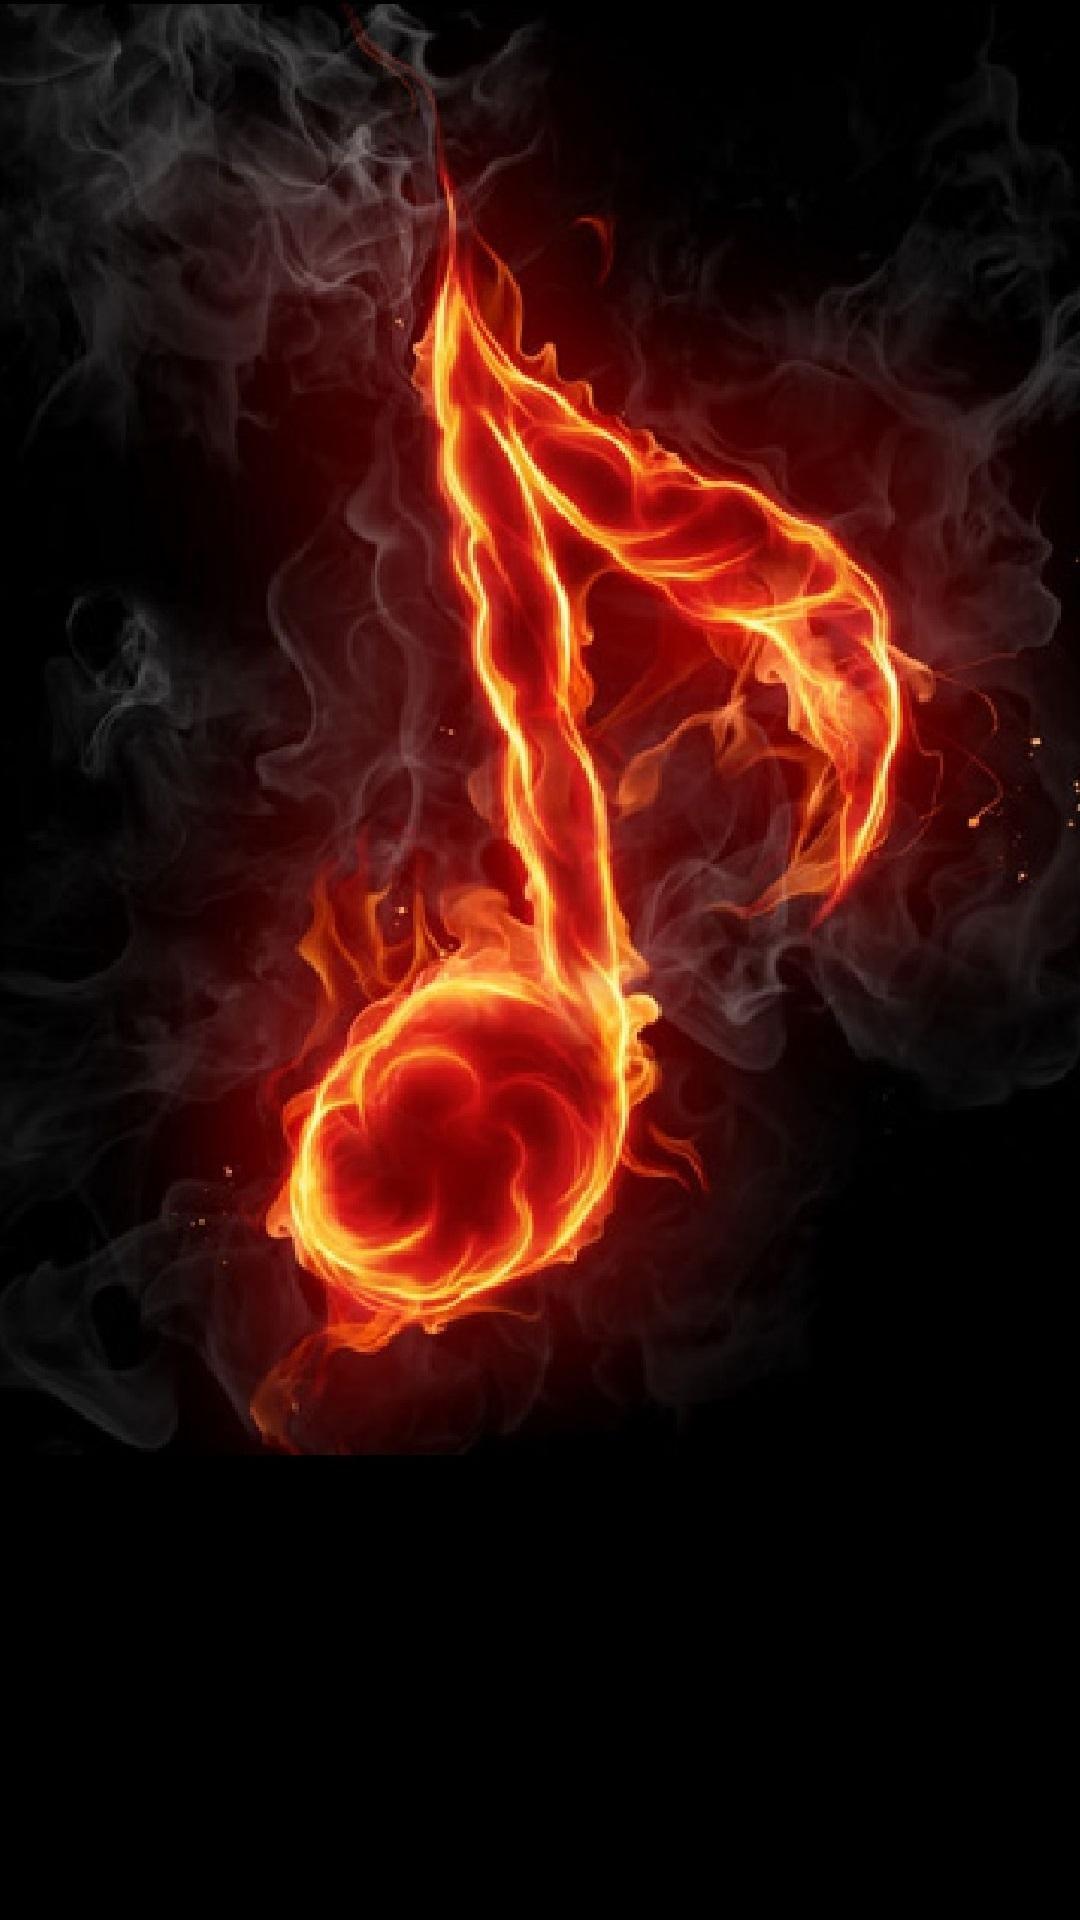 Music Note Fire Music Wallpaper Music Notes Music Artwork